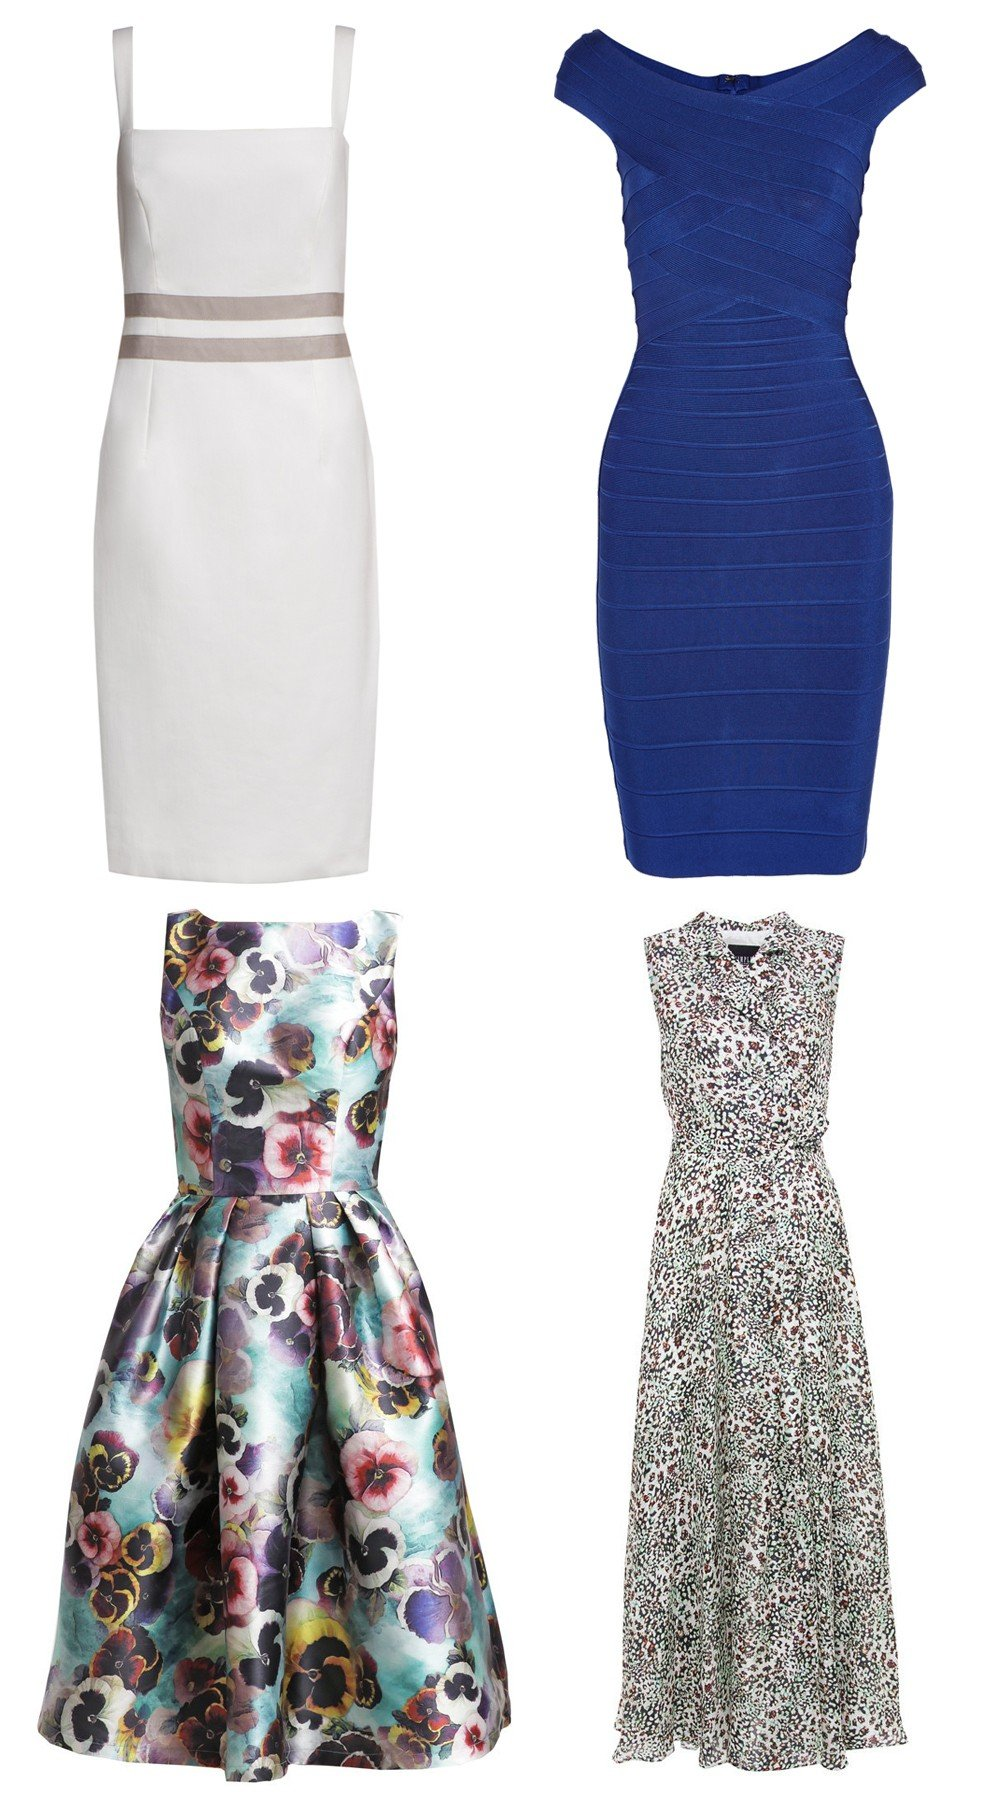 ad4c59a8ab Dress code - sukienka - Fashionpost